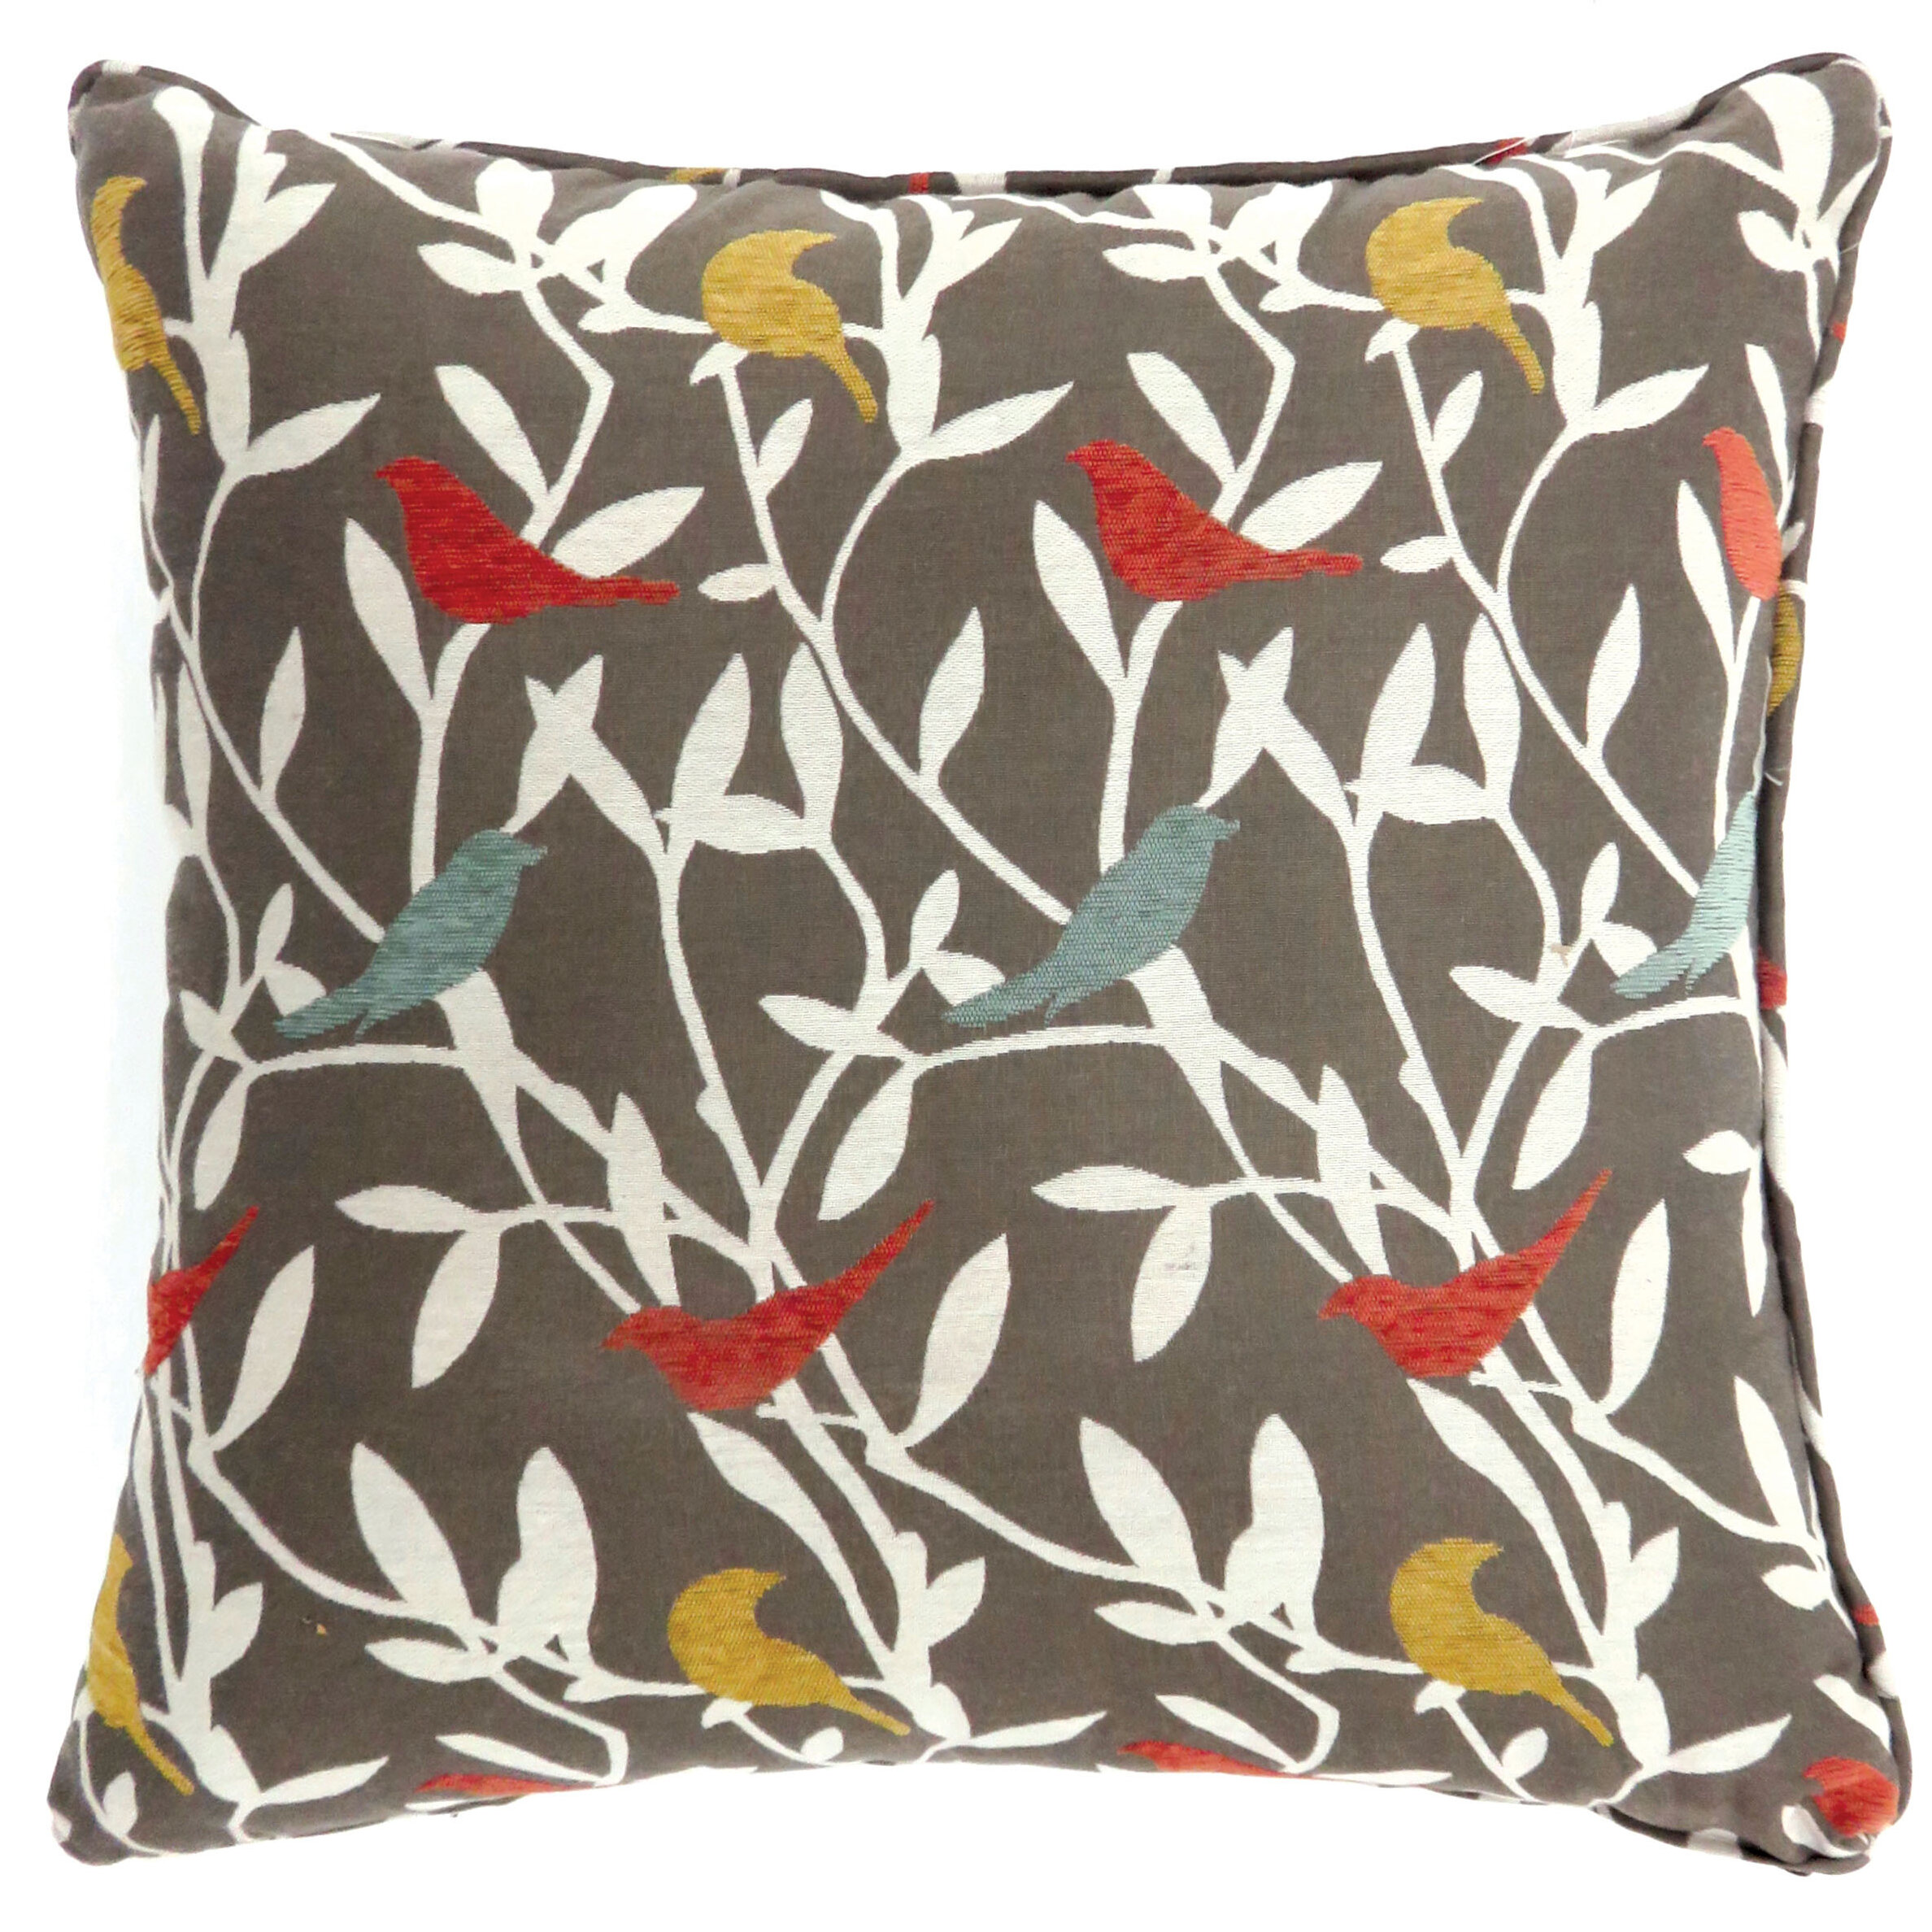 Animal Print Traditional Throw Pillows You Ll Love In 2021 Wayfair